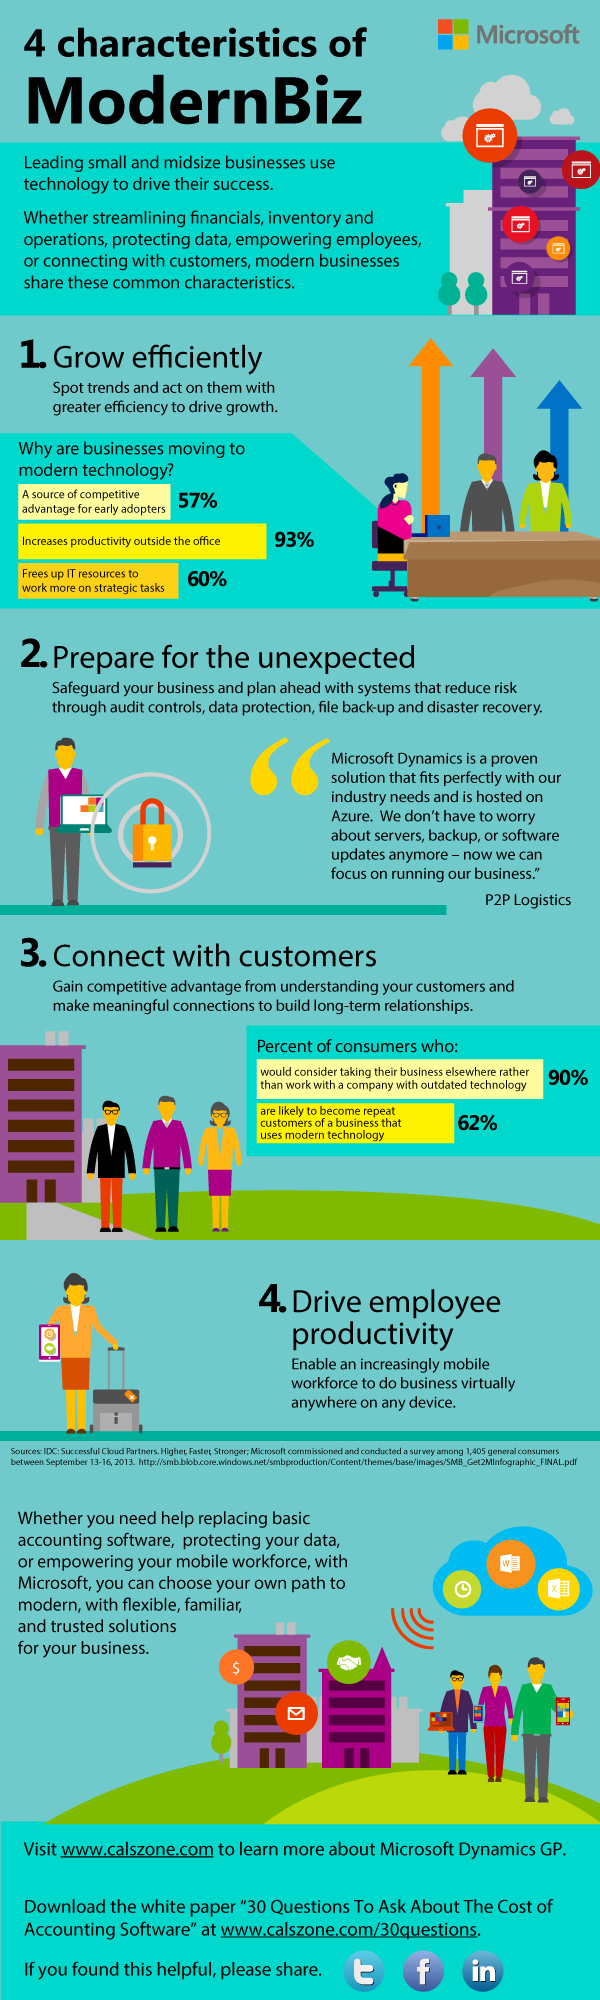 4-characteristics-modern-biz